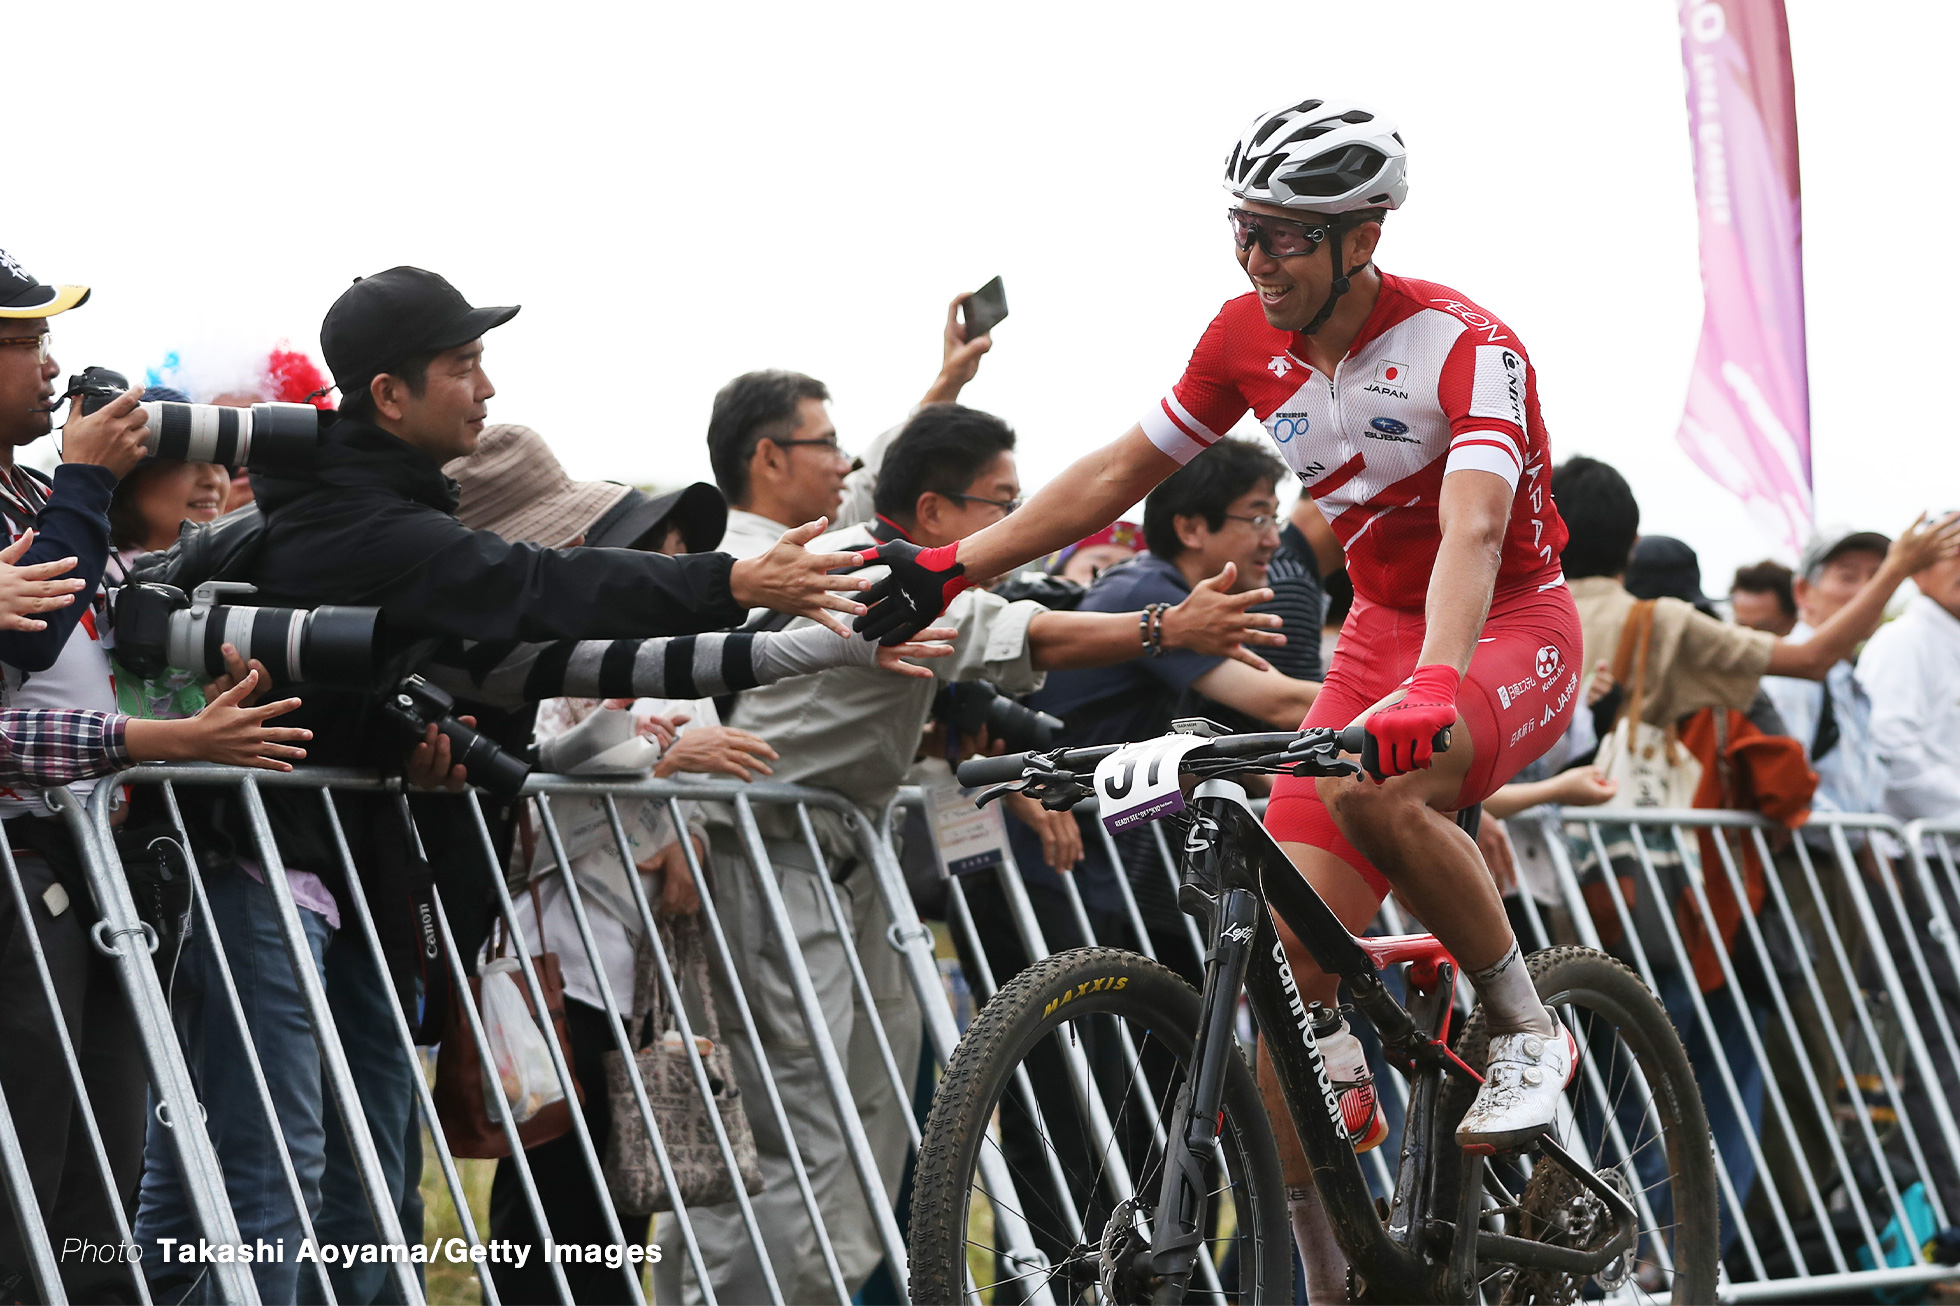 IZU, JAPAN - OCTOBER 06: Kohei Yamamoto of Japan celebrates at the finish during the Cycling - Mountain Bike Tokyo 2020 Test Event on October 06, 2019 in Izu, Shizuoka, Japan. (Photo by Takashi Aoyama/Getty Images)